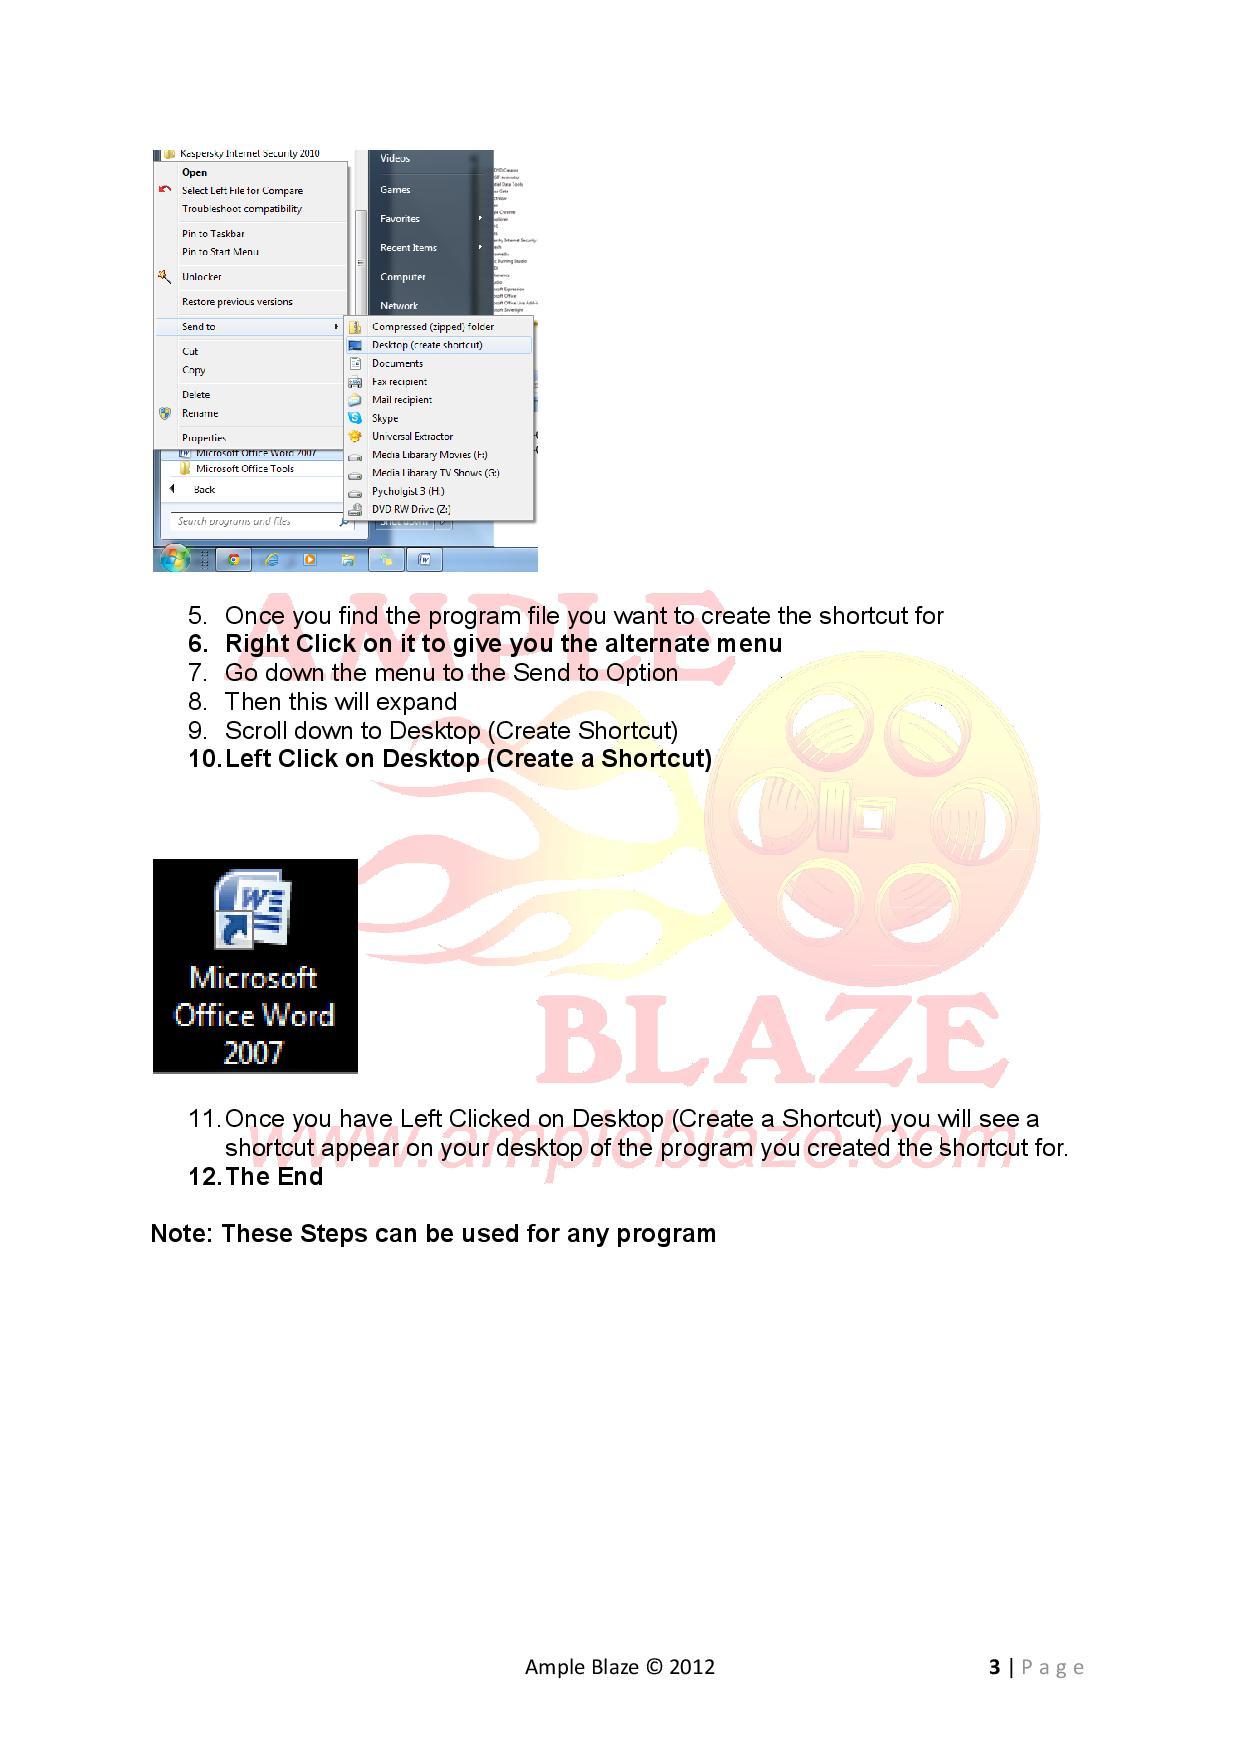 Ample Blaze Create Shortcut Windows 7-page-003